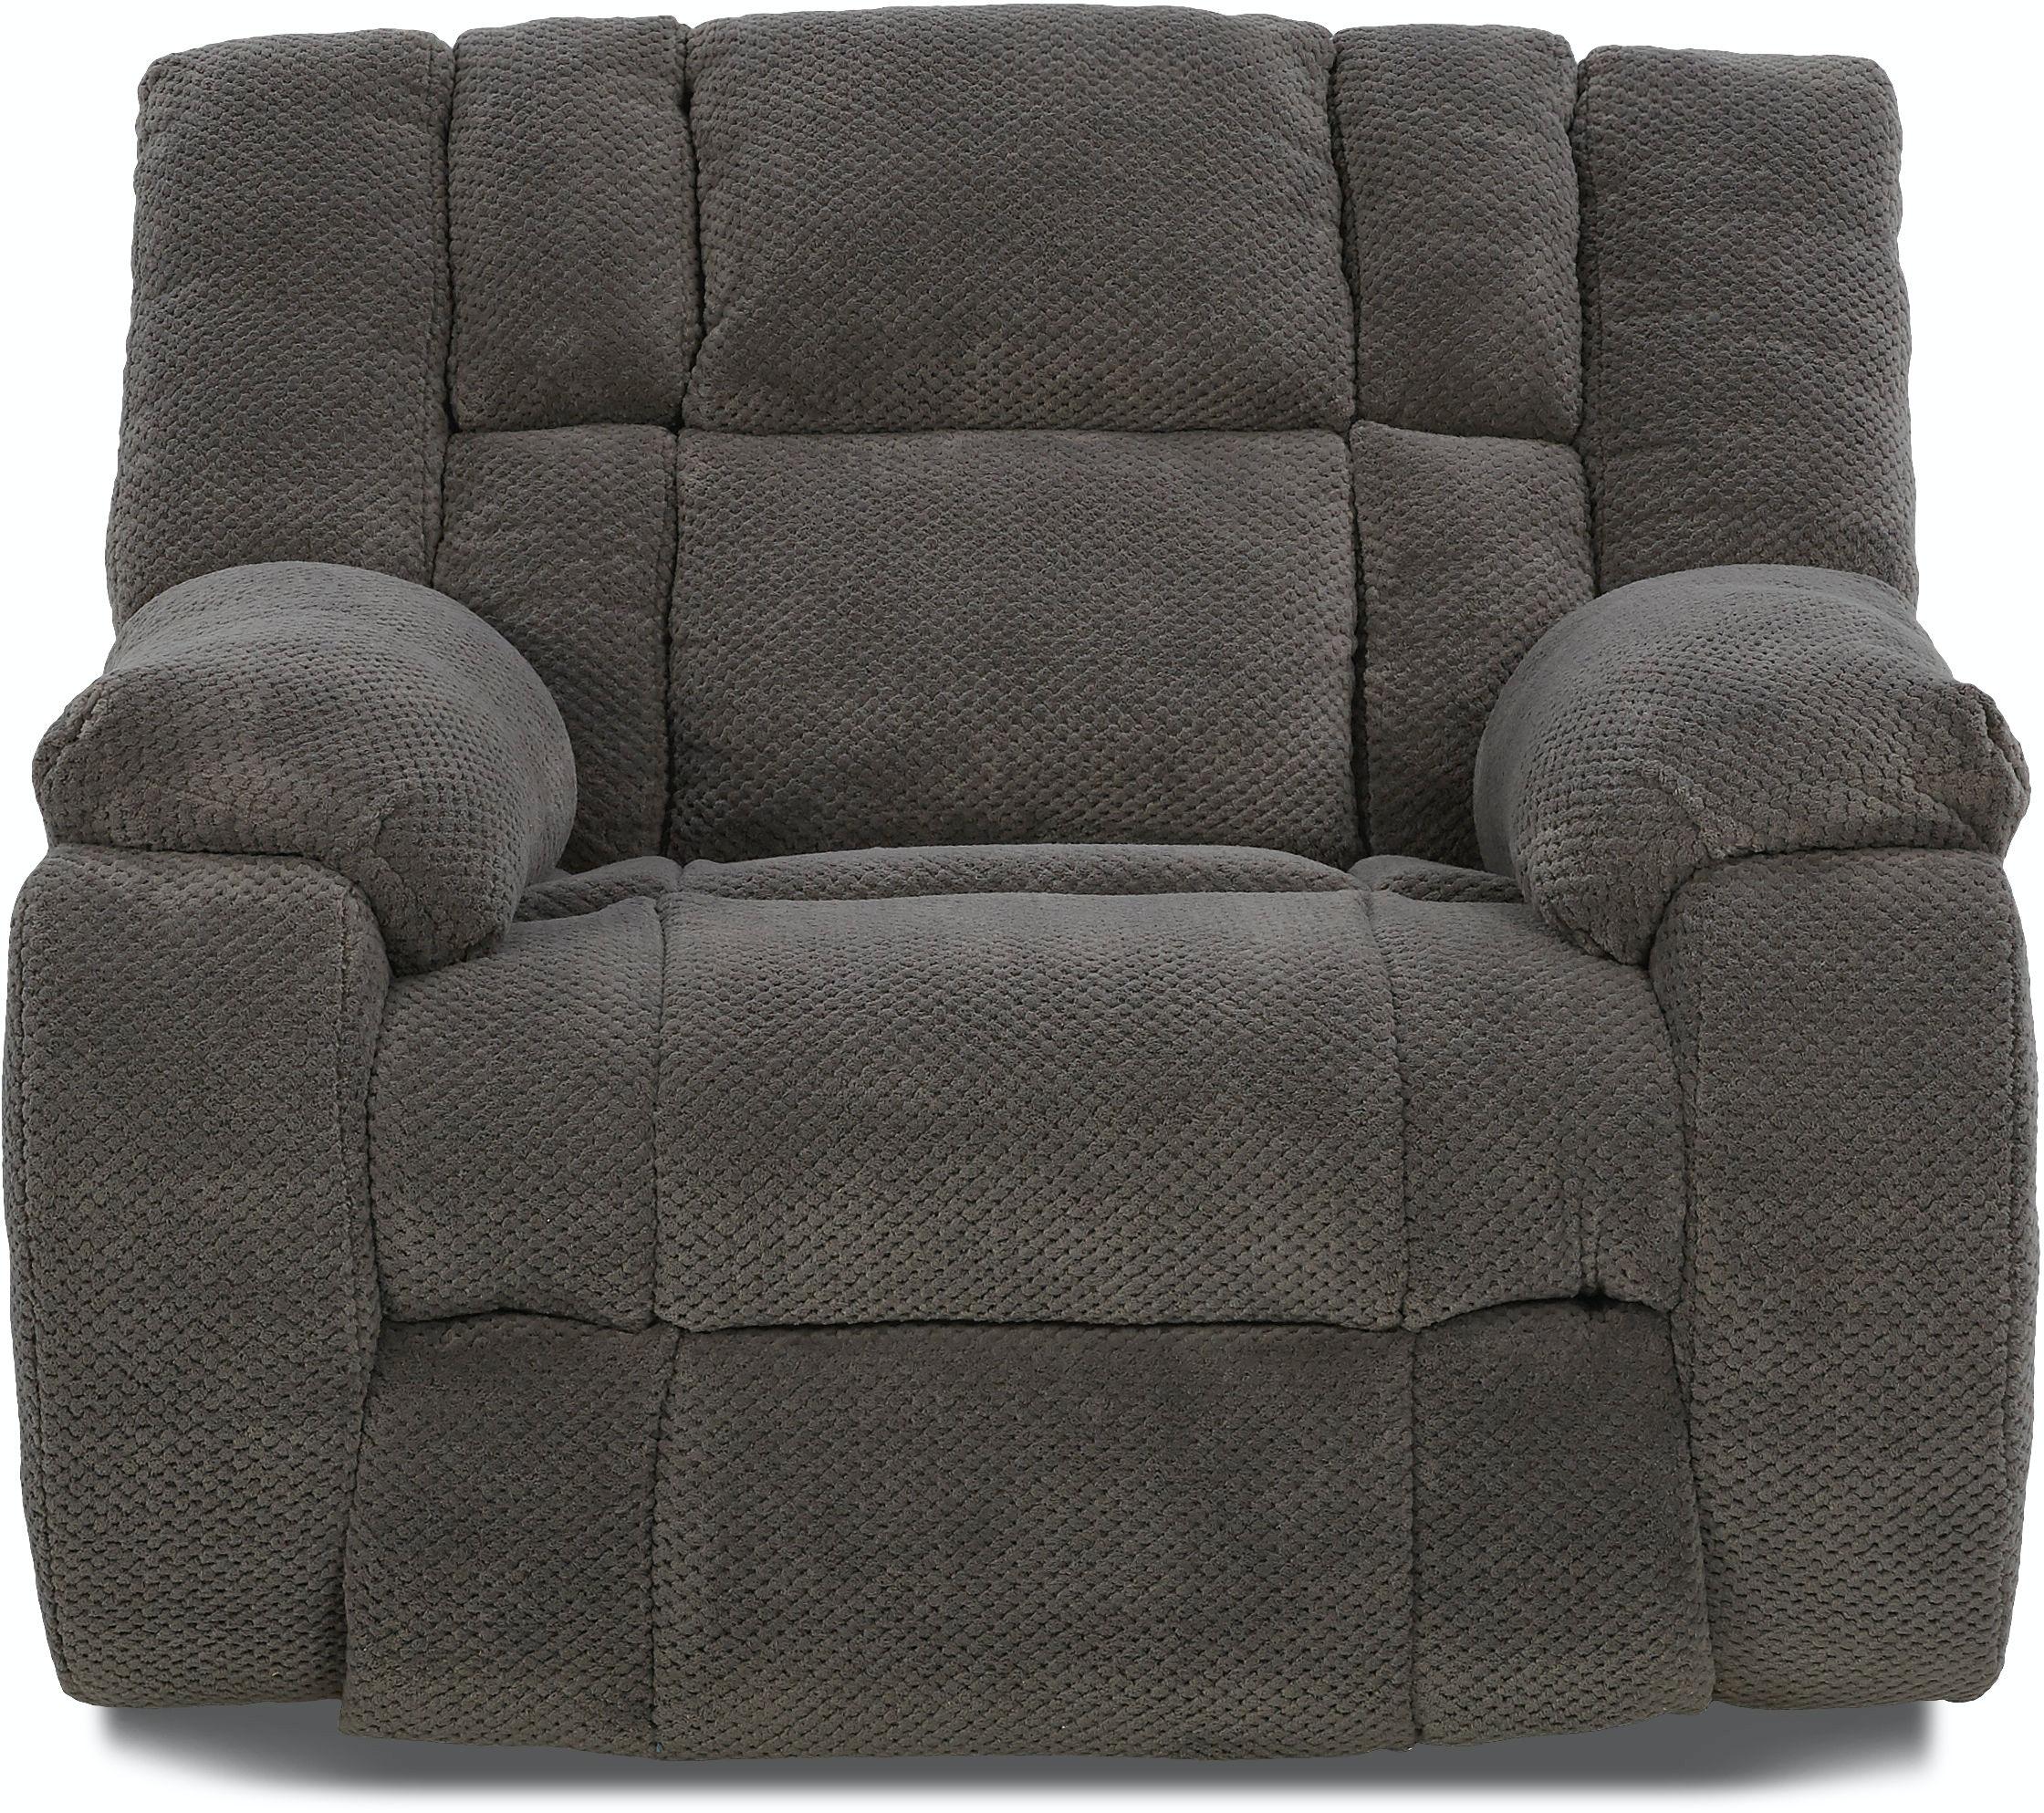 Klaussner Living Room Dozer Chair 87803 Rbc Brownlee S